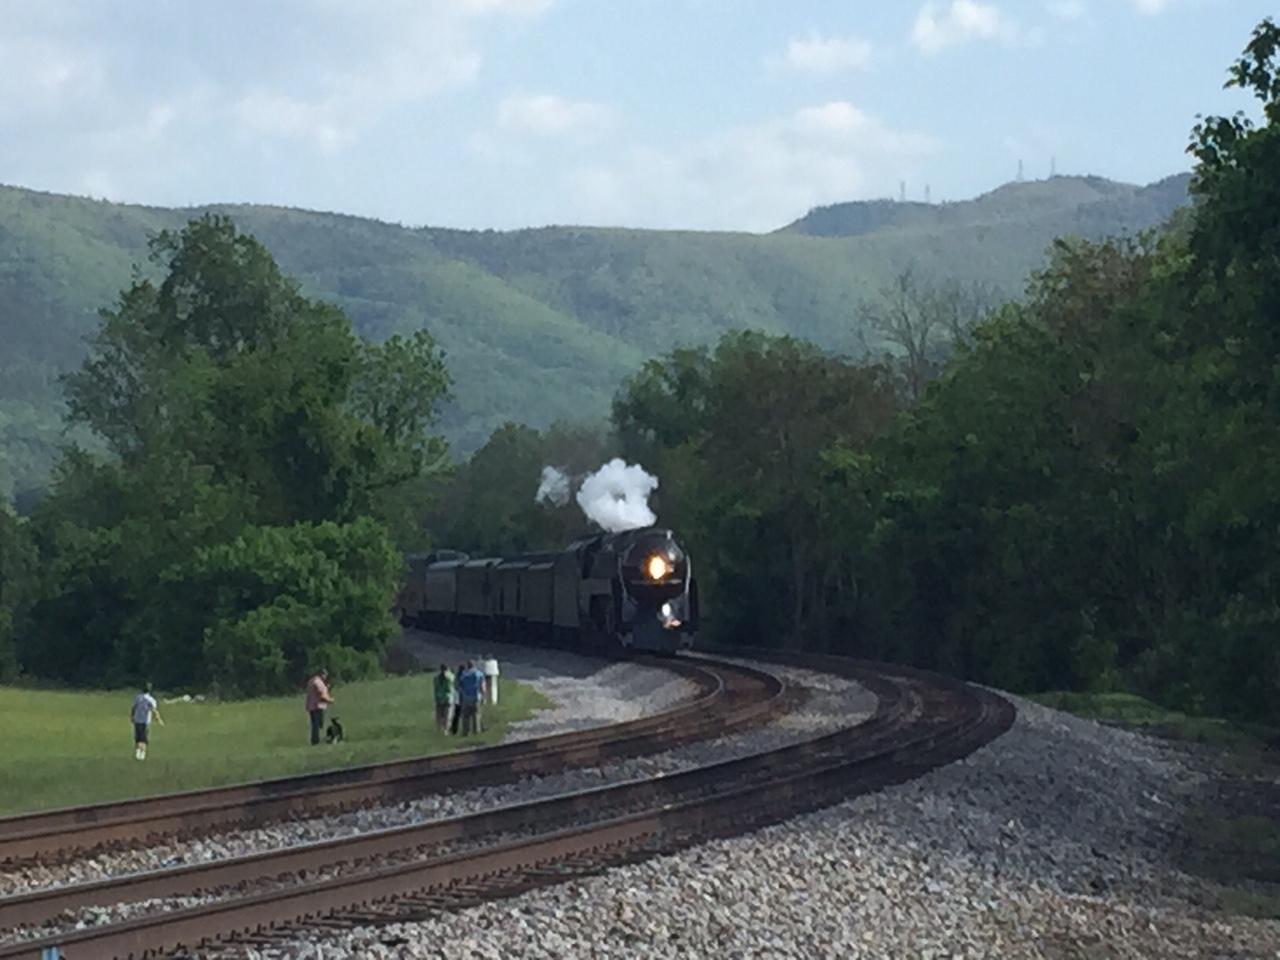 The 611 Steams toward us.